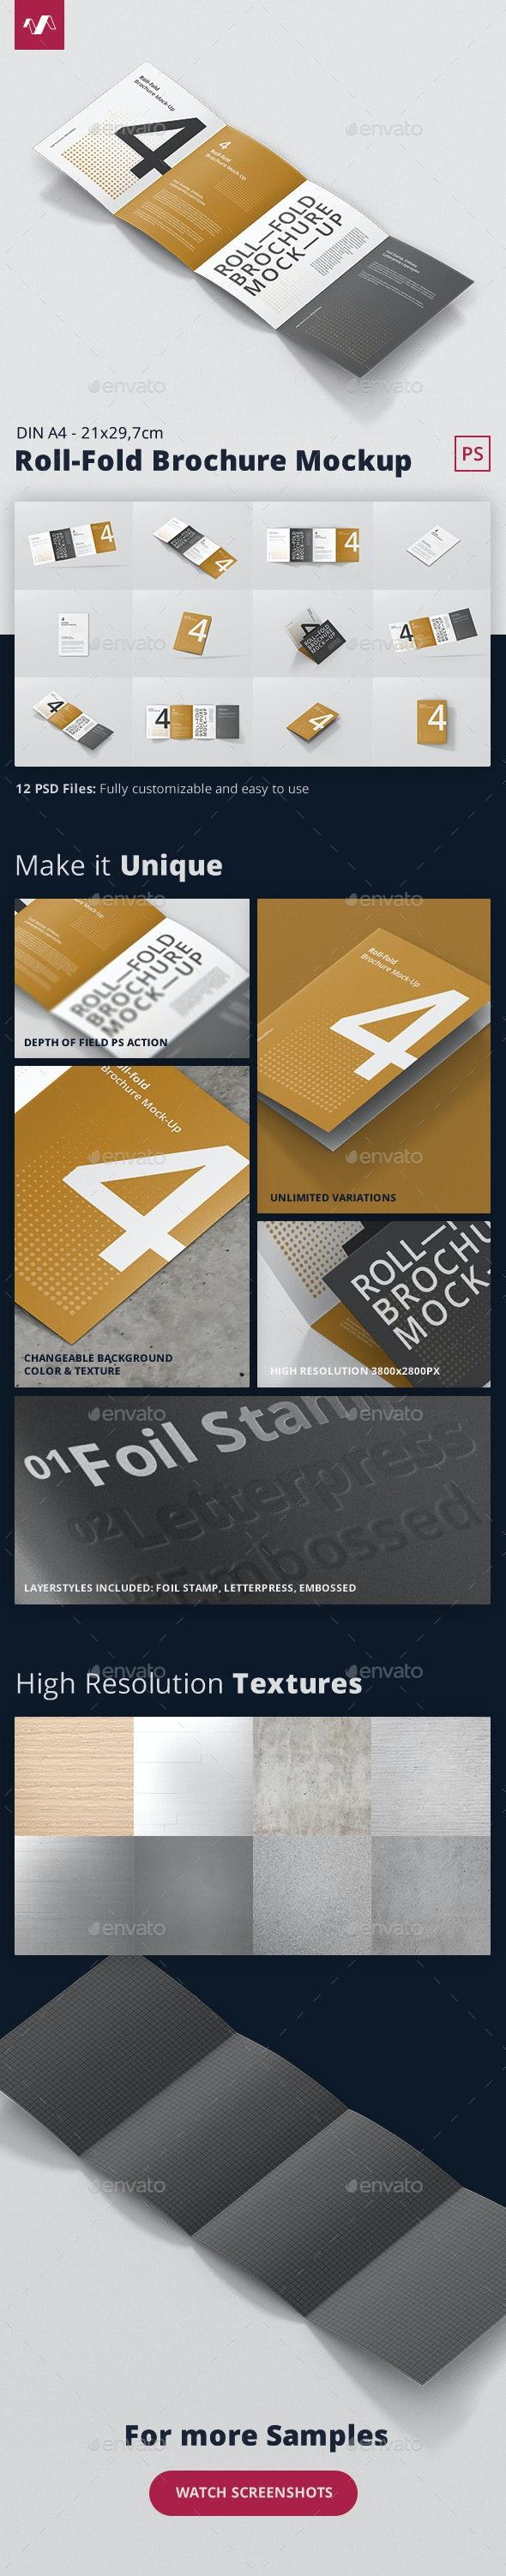 Roll-Fold Brochure Mockup - Din A4 A5 A6 - Brochures Print